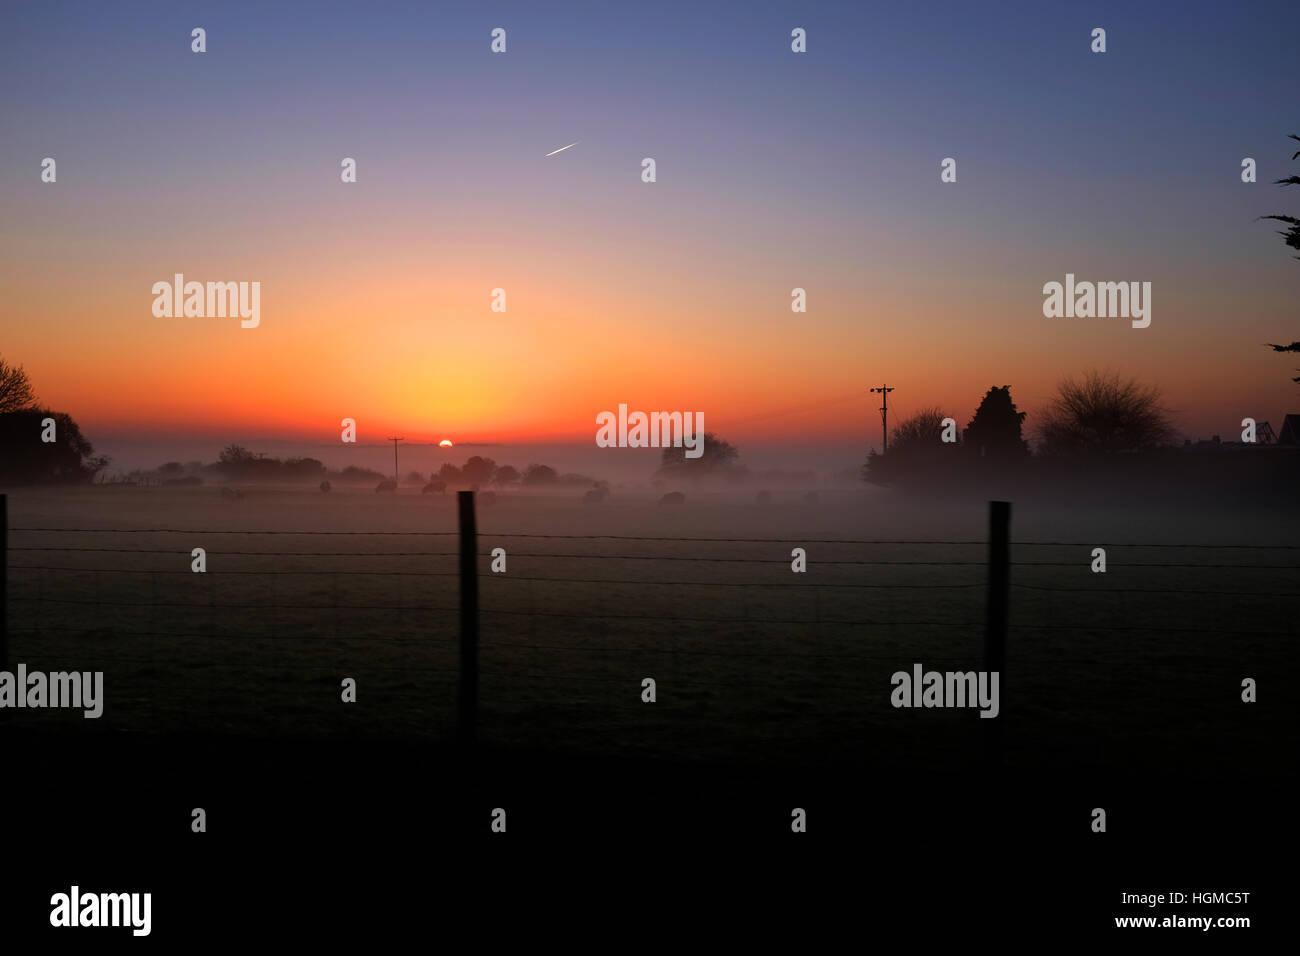 sunset across misty field with fence autumn frosty trees Northwood Isle of Wight England UK - Stock Image